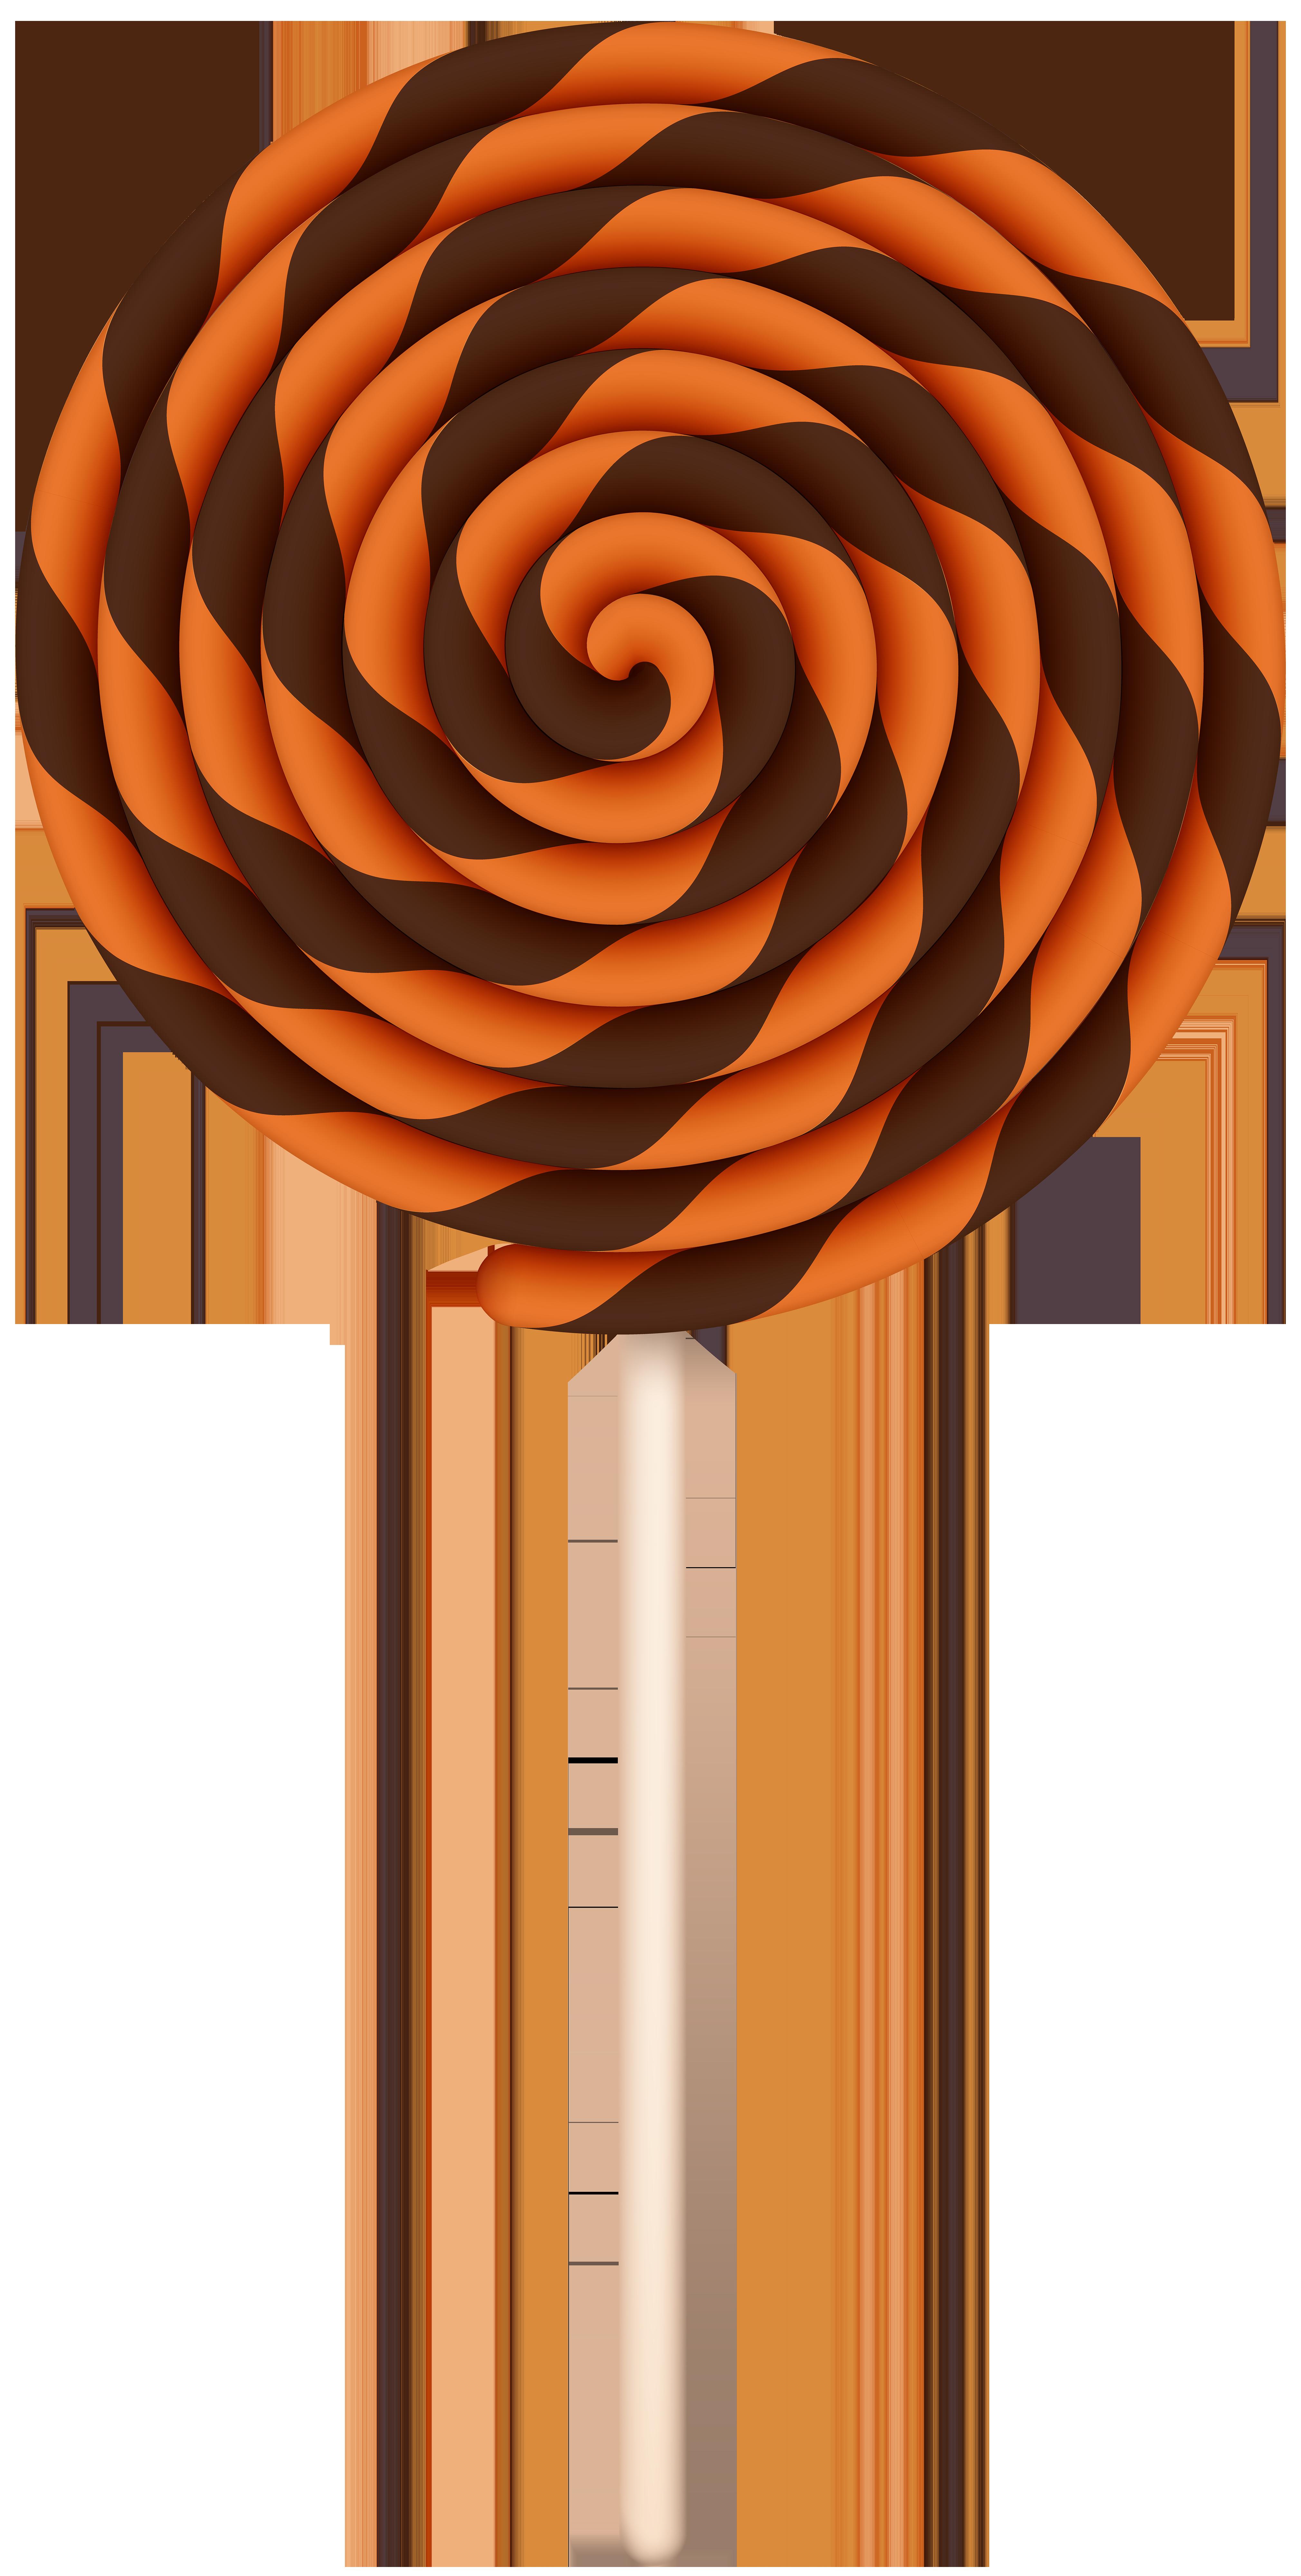 Halloween lollipops clipart png transparent library Halloween Swirl Lollipop PNG Clip Art Image | Gallery Yopriceville ... png transparent library